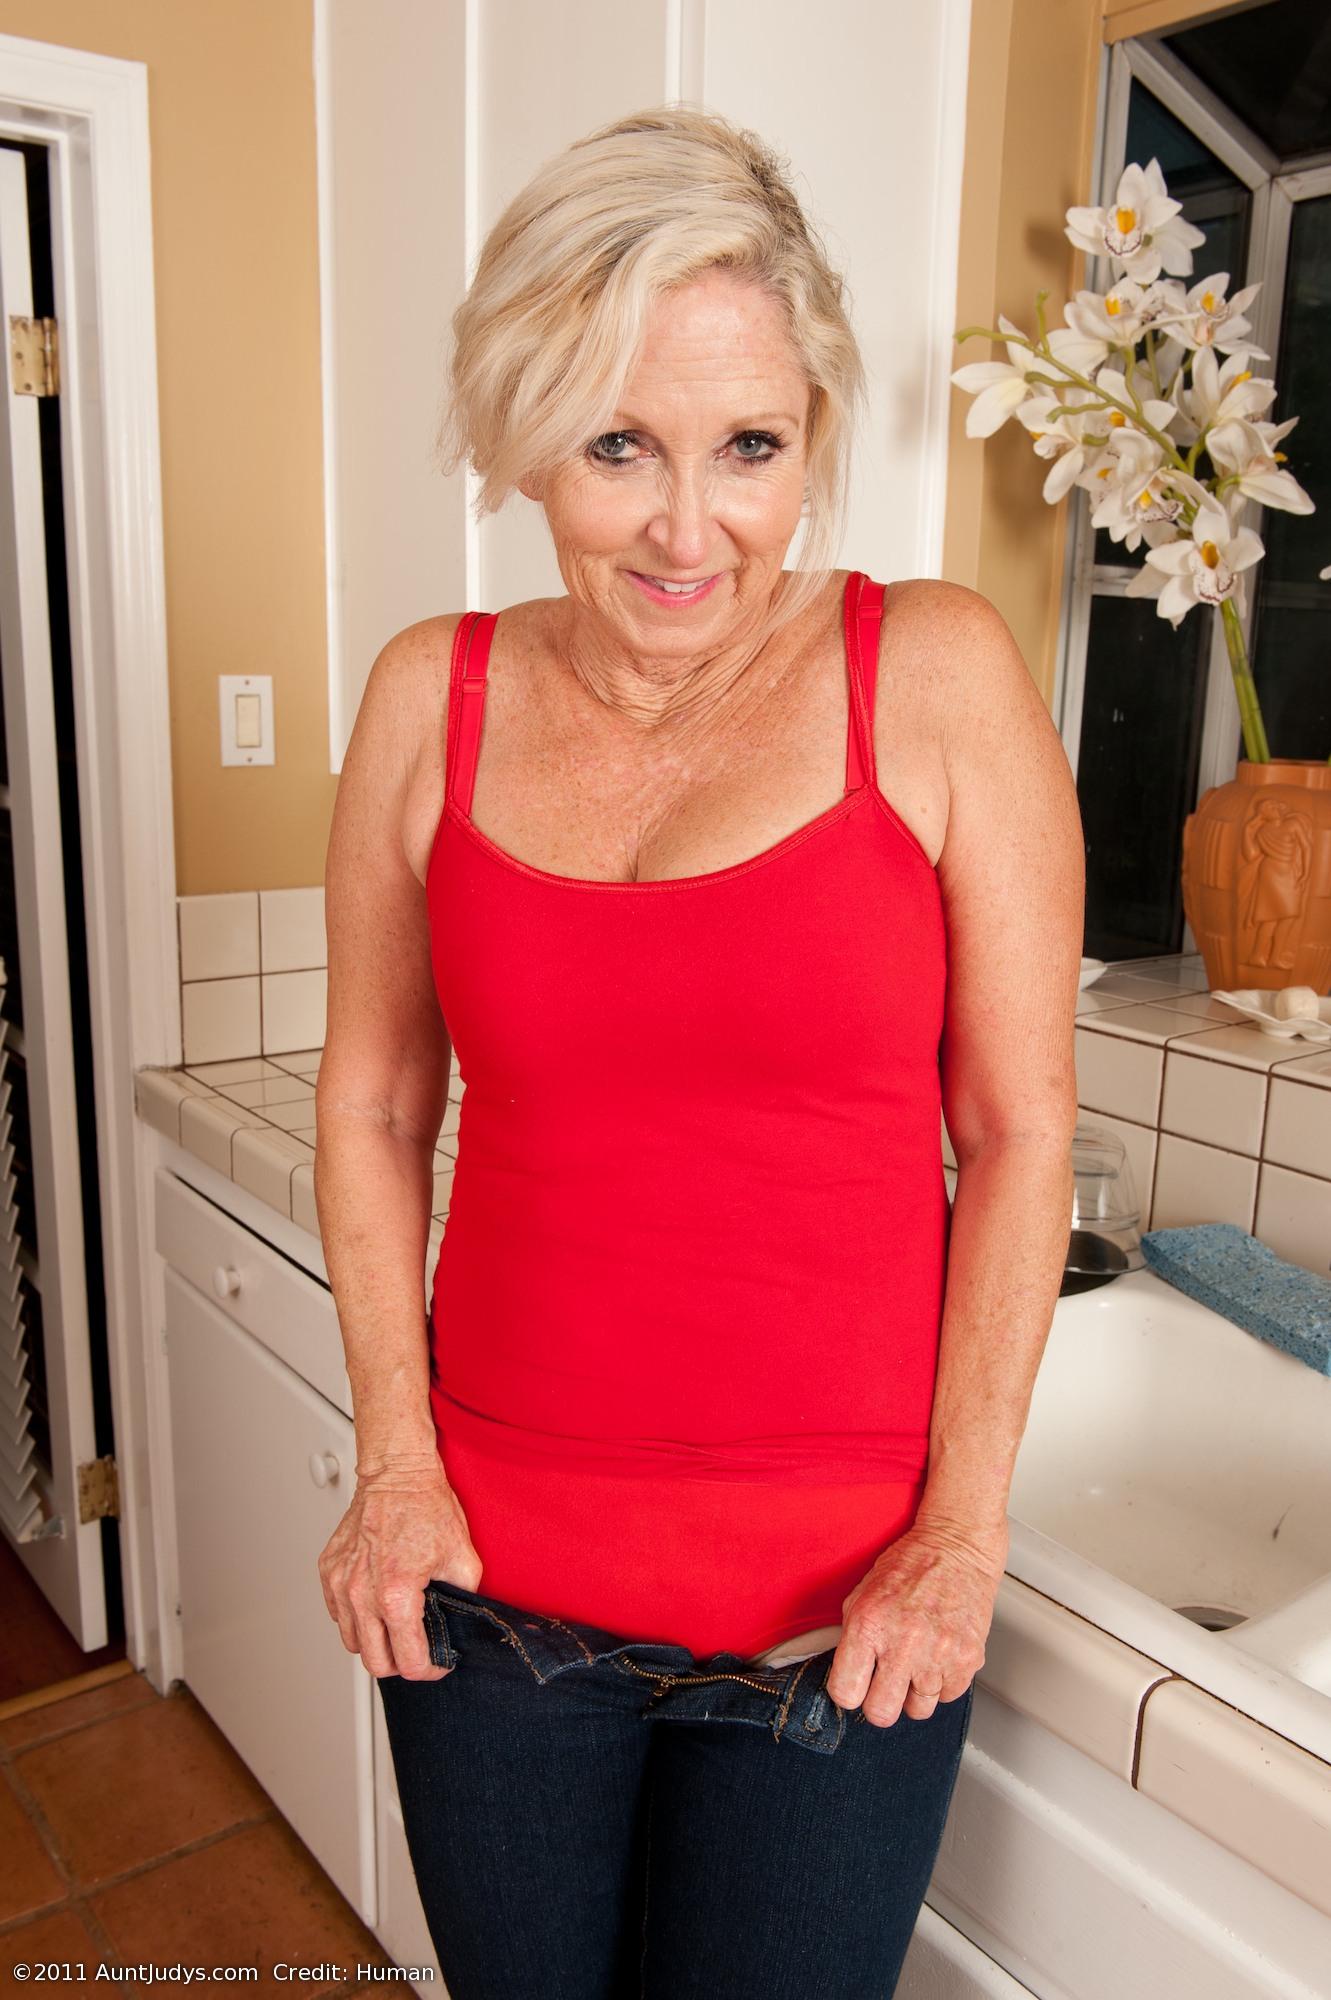 Aunt Judys